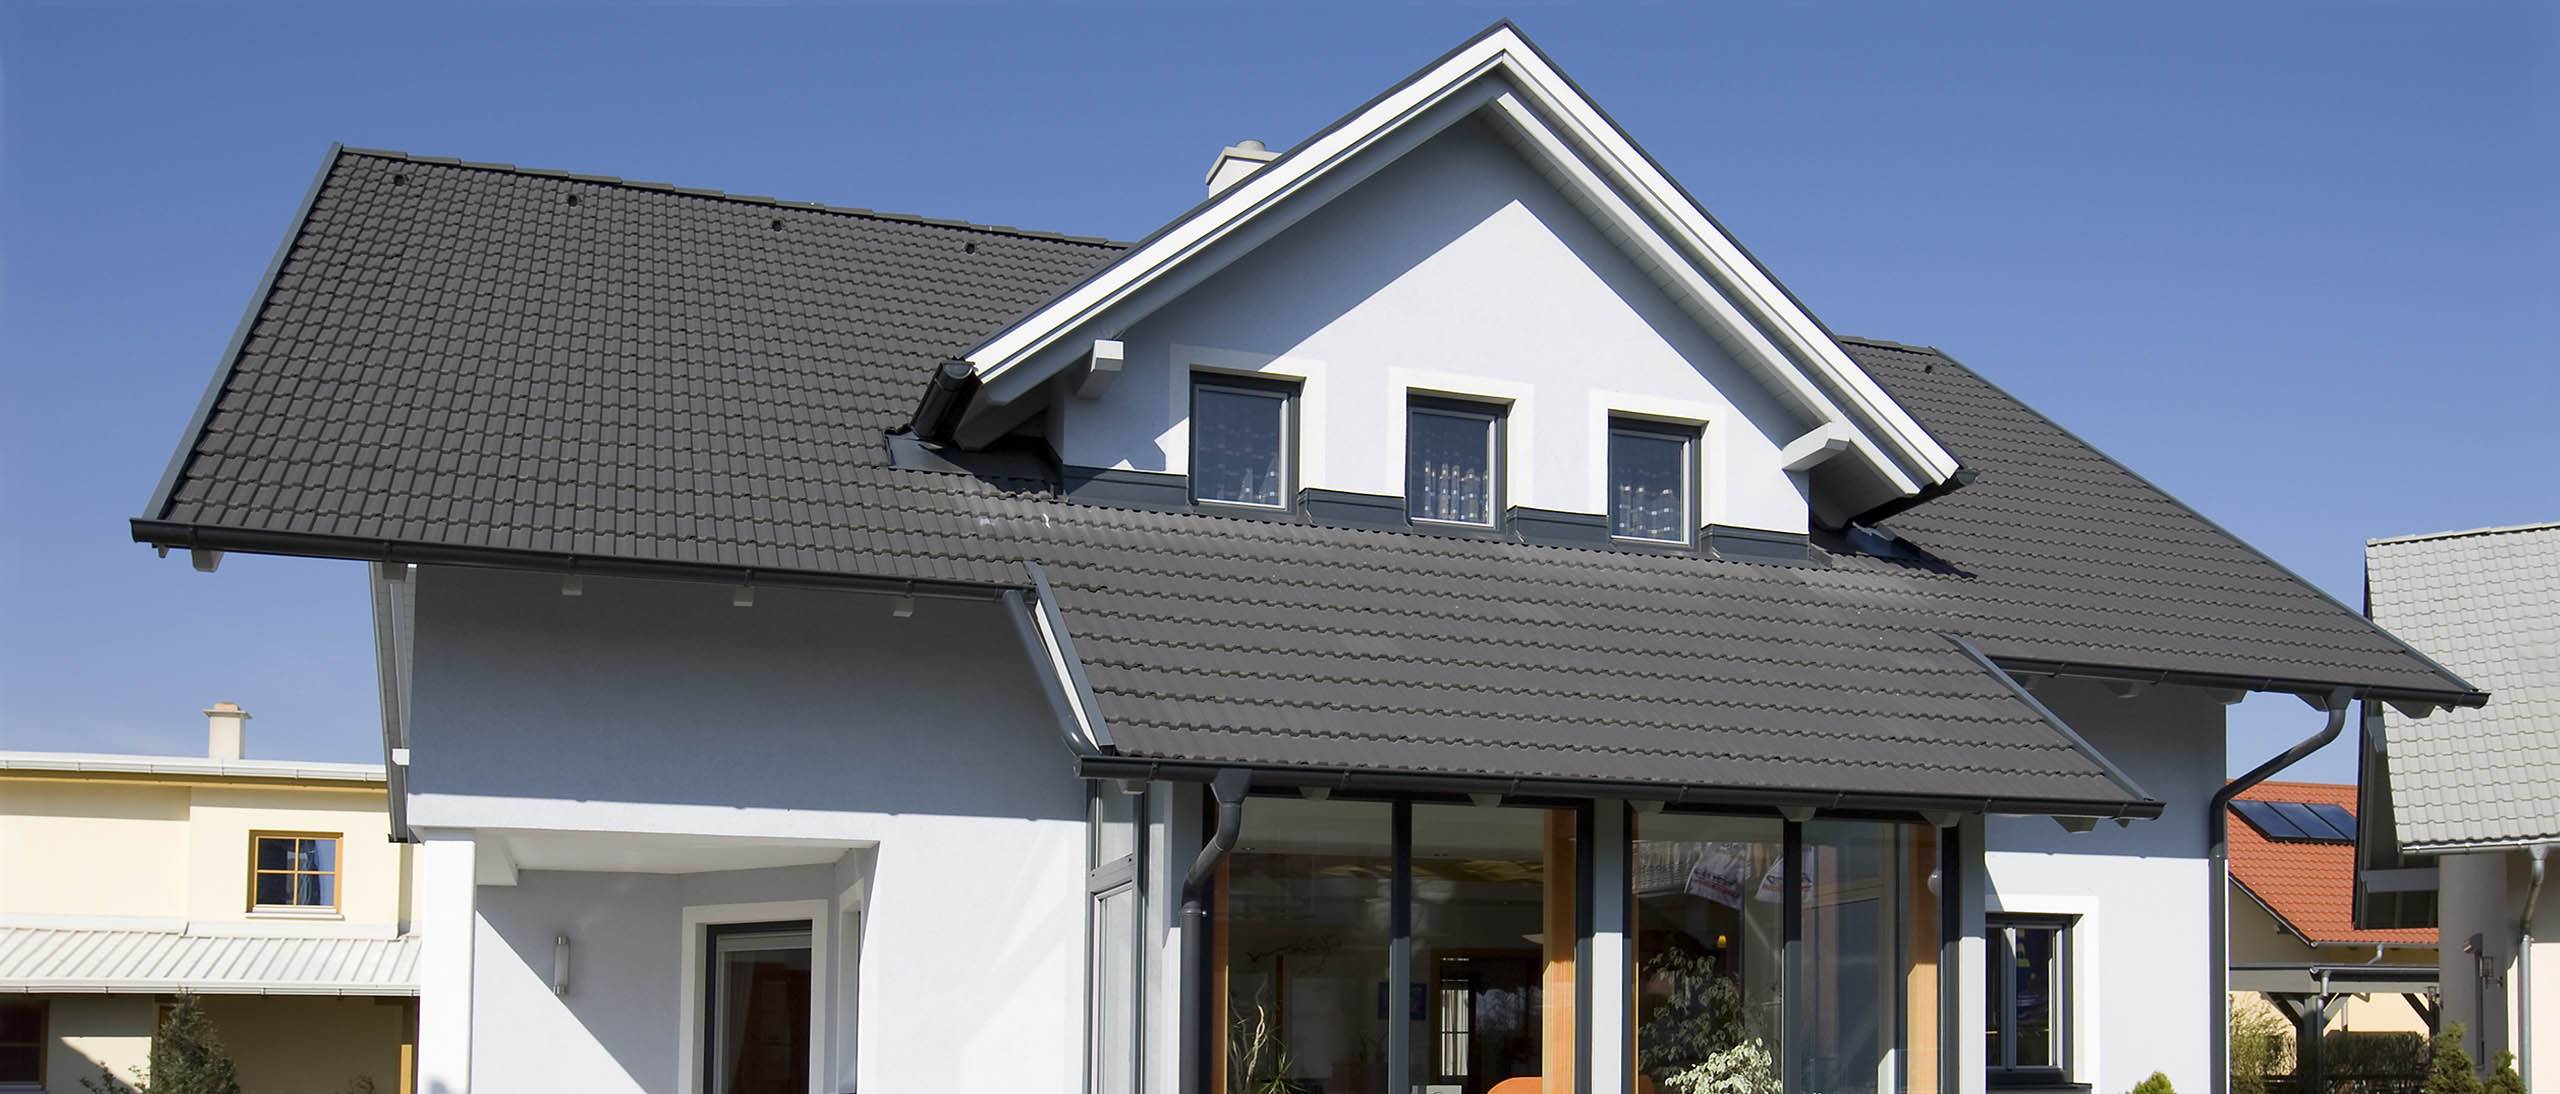 https://kuenner-immobilien.de/wp-content/uploads/2020/05/banner-verkauf-1.jpg